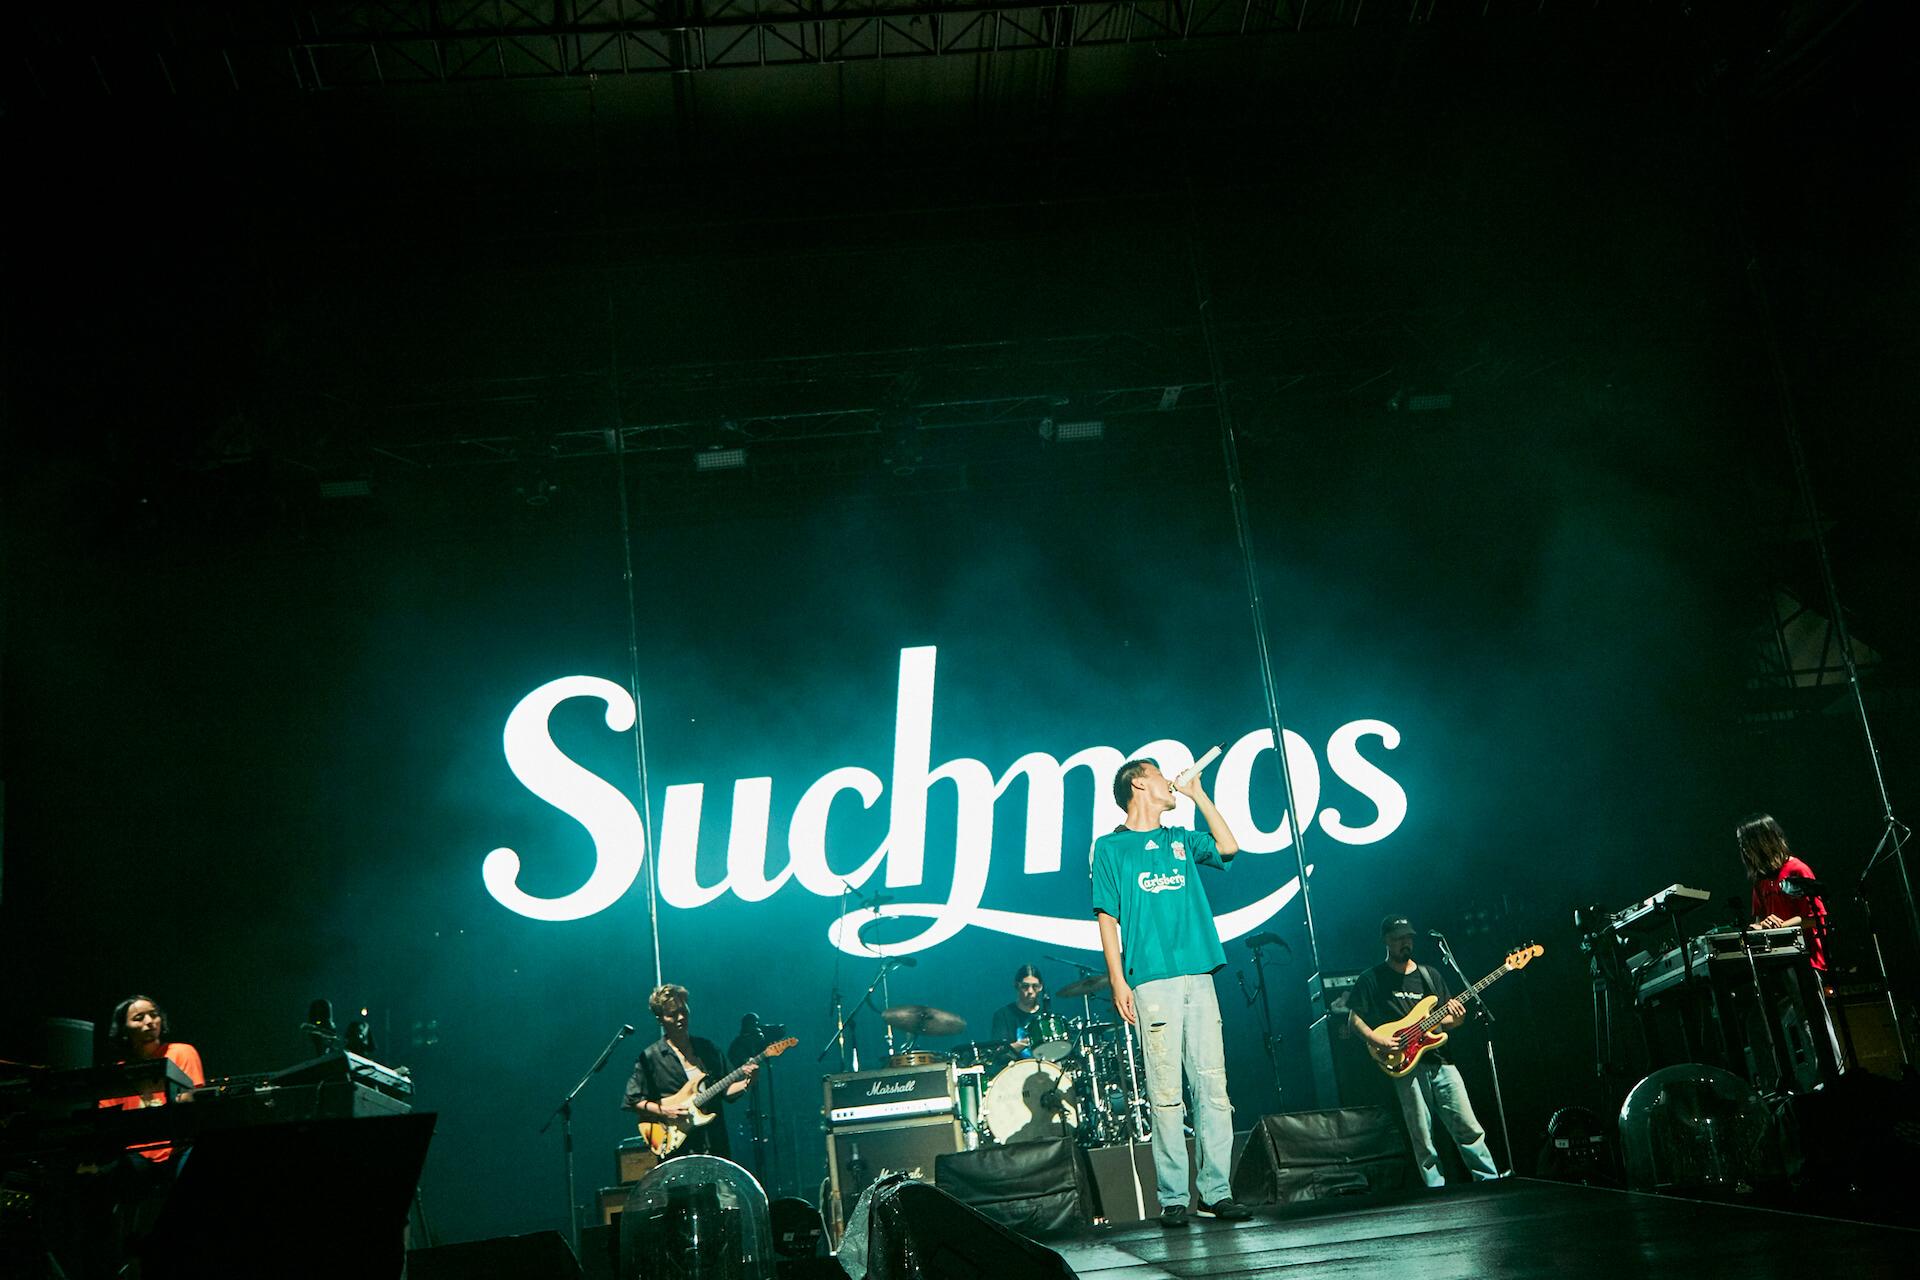 【Photo Documentary】Suchmos THE LIVE 横浜スタジアム d975793401fe6c3500e59c49826e3d28